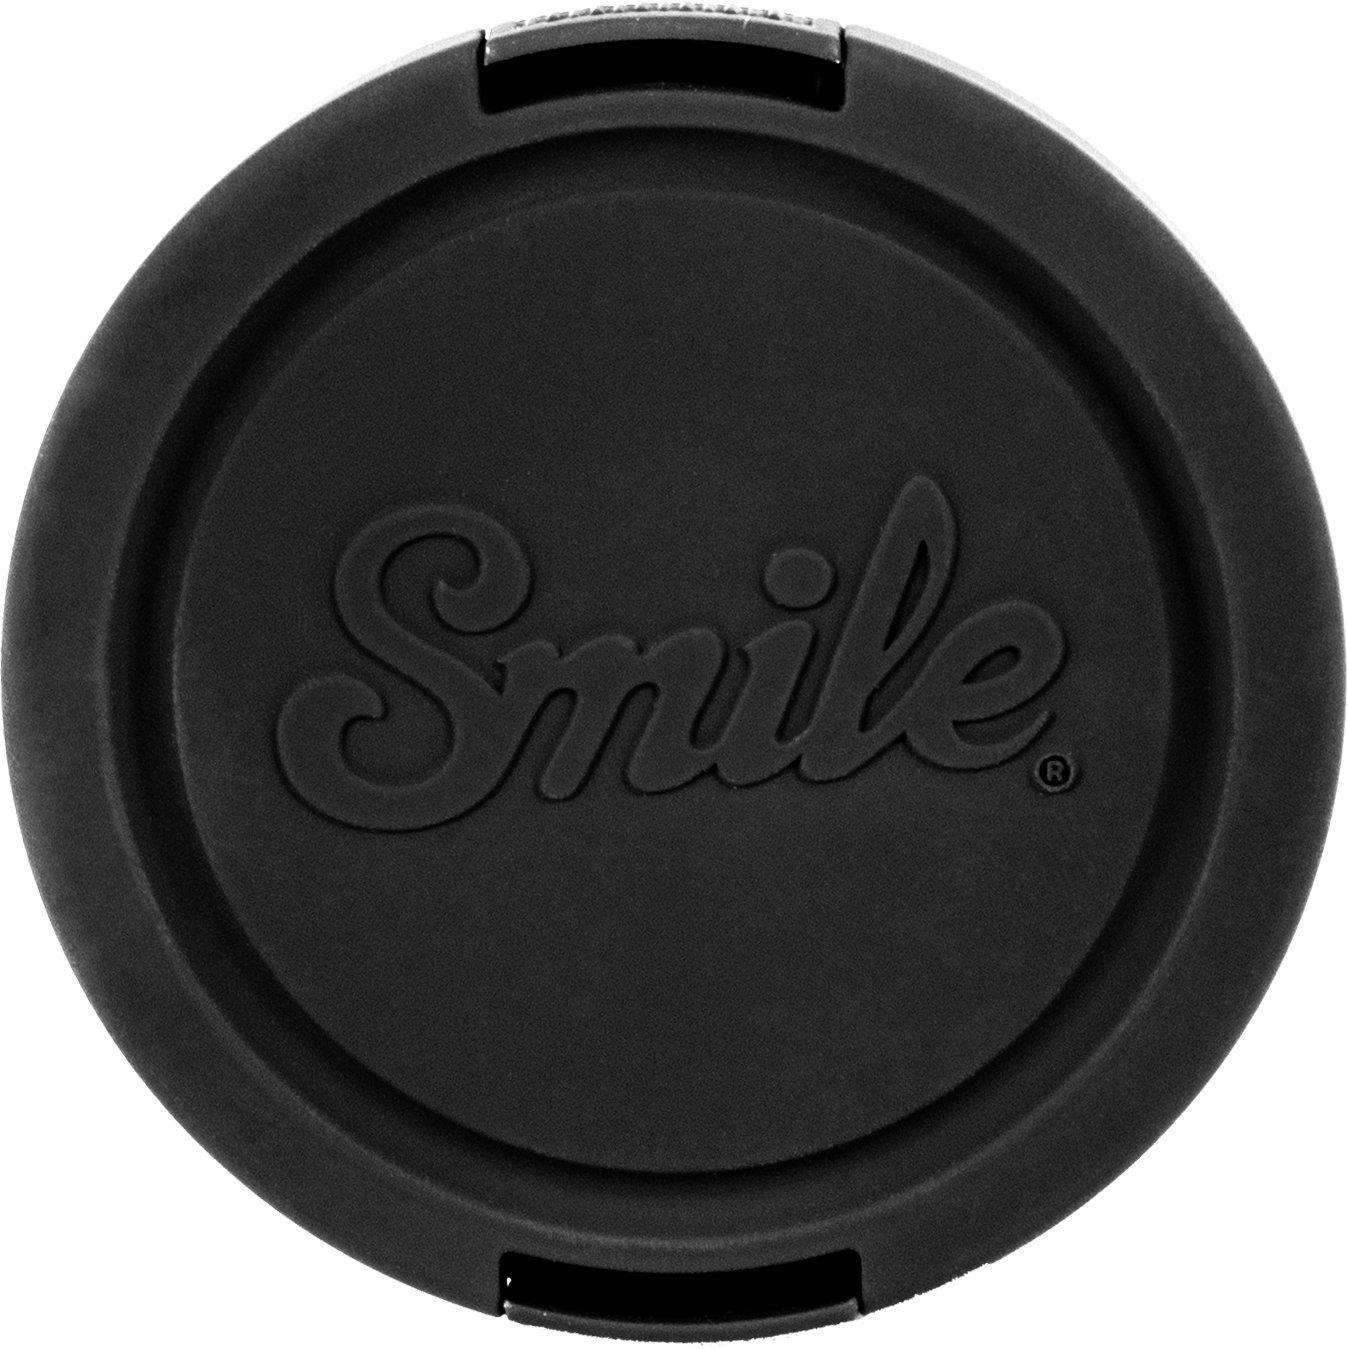 Smile Tapa para Objetivo Pin-up 67mm